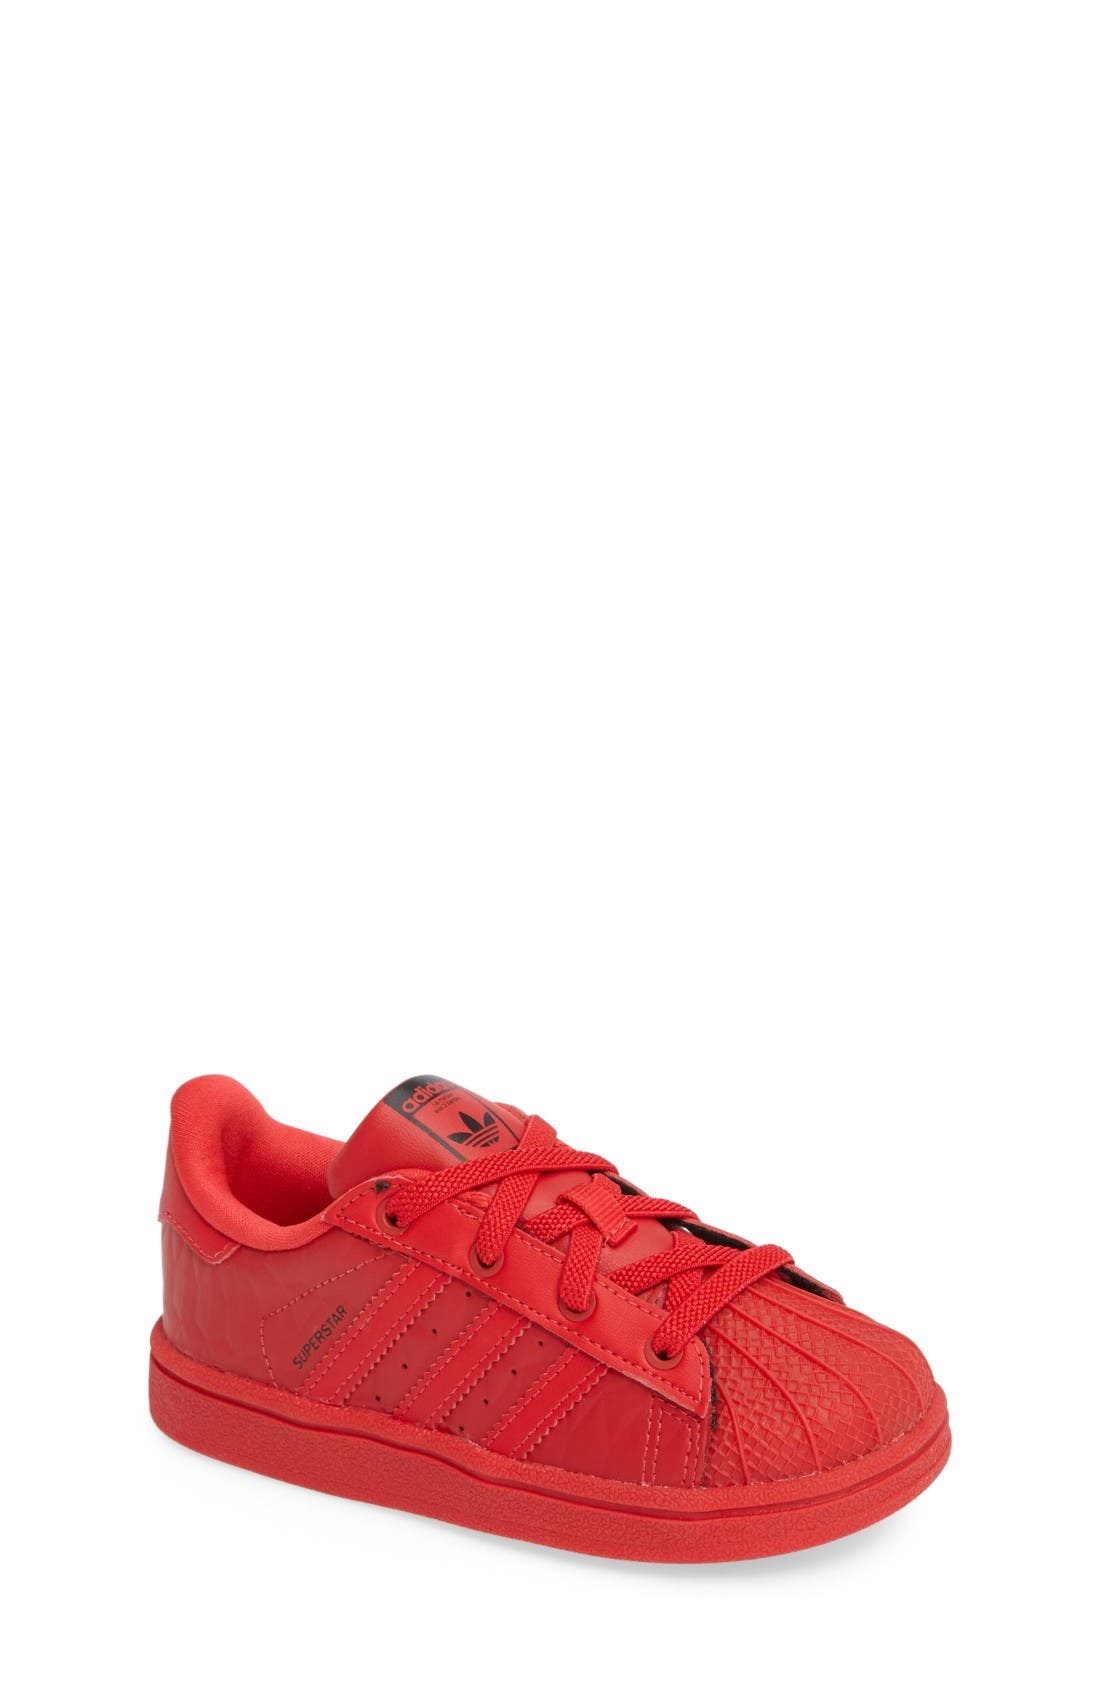 Main Image - adidas Superstar Sneaker (Baby, Walker & Toddler)